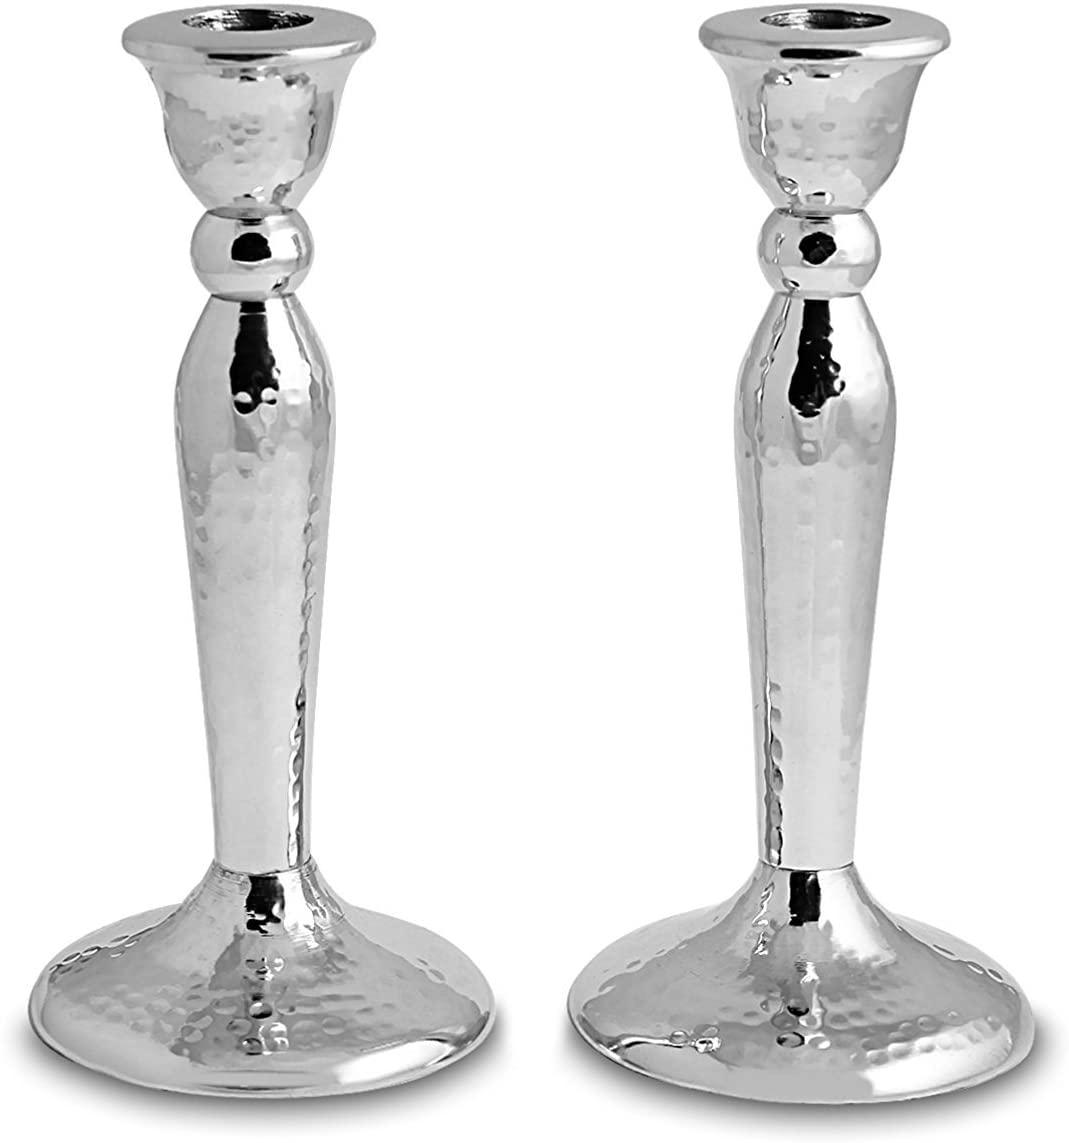 Zion Judaica Classic Hammered Aluminum Candlestick Set